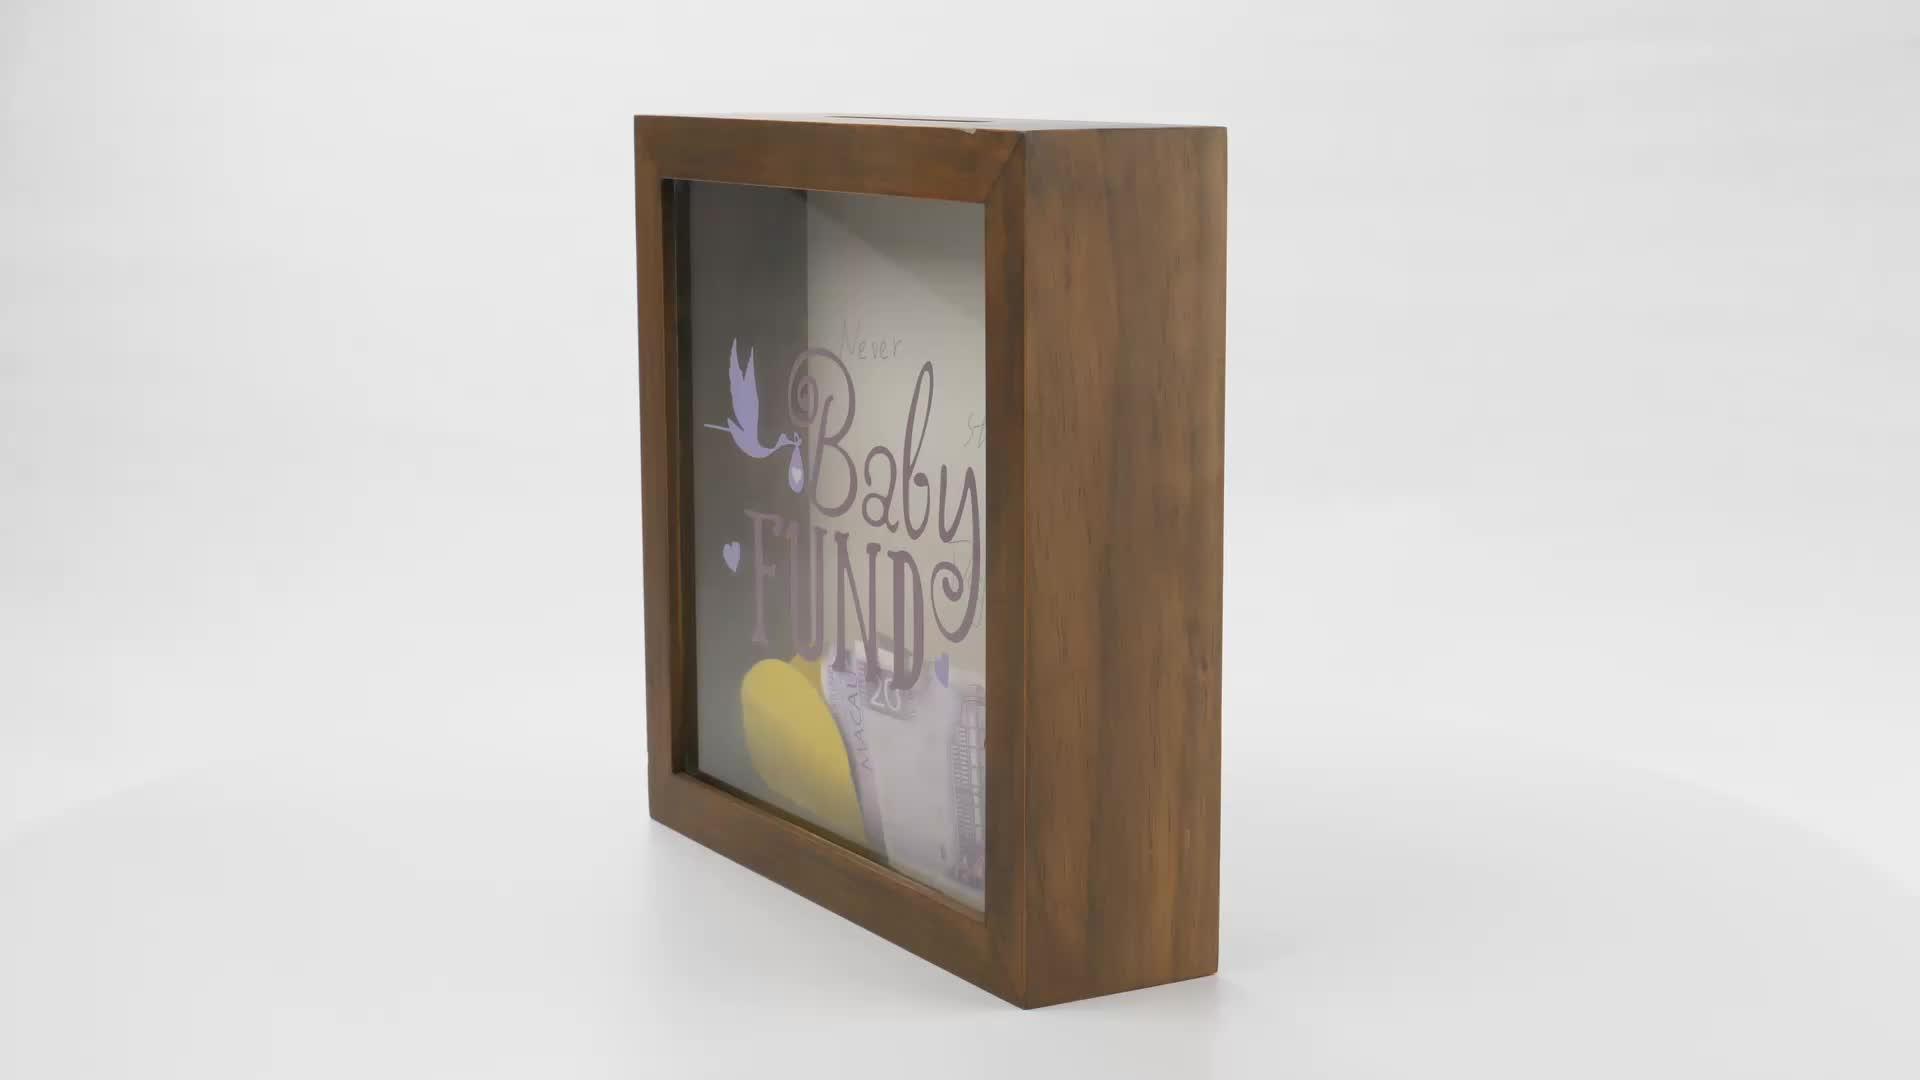 Hochwertige Desktop Display Münze Sammlung Holz 3D Schatten Box Rahmen Ticket Saving Stub Halter Fall